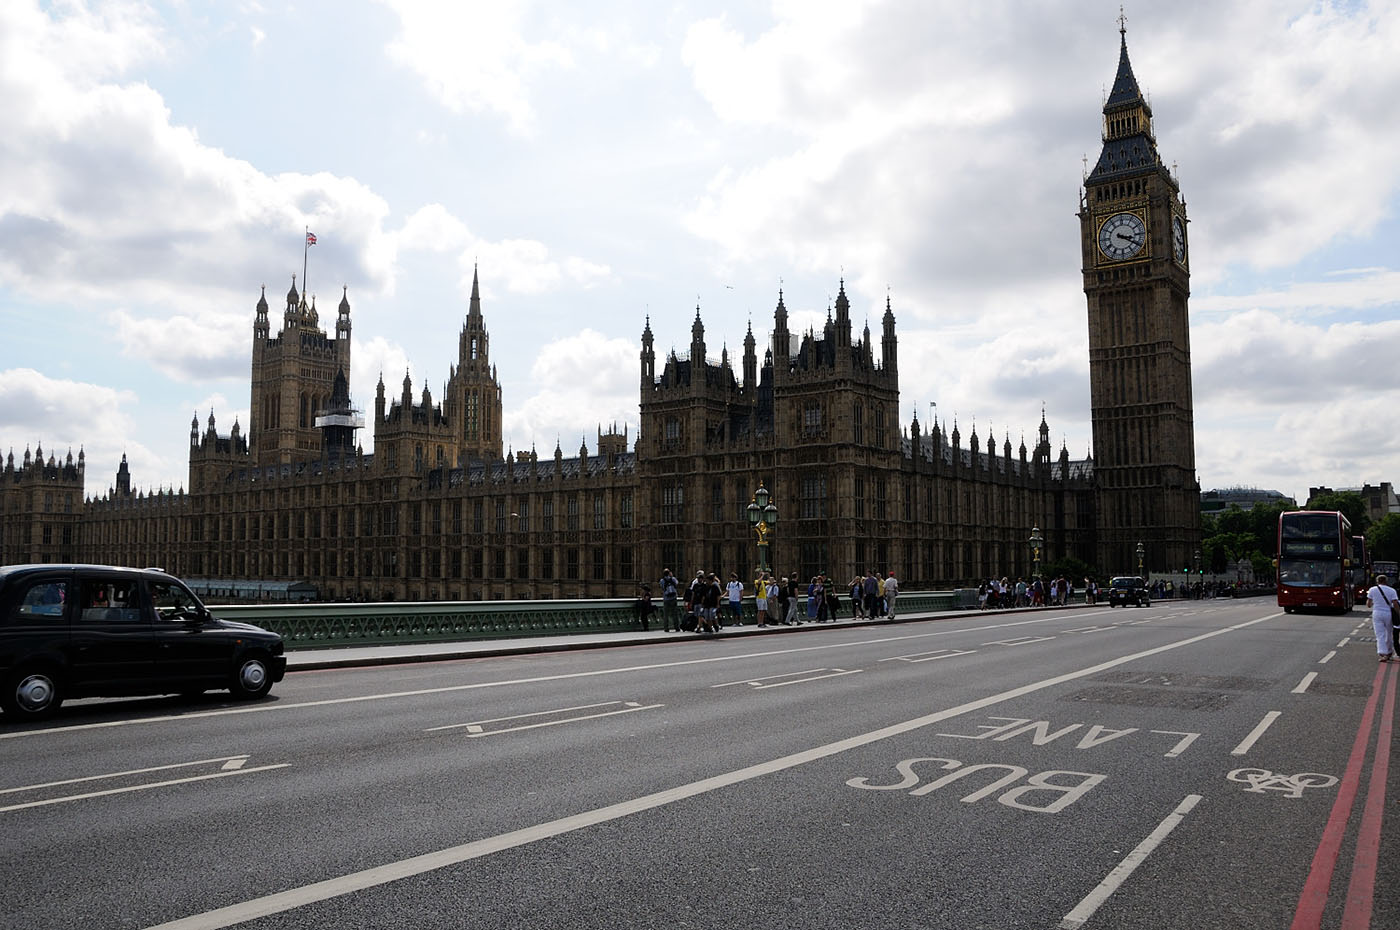 Фотография 1. Обзор камеры Nikon D300s. Лондон. Биг Бен. Параметры съемки: ISO 200, F8, 1/800 s.